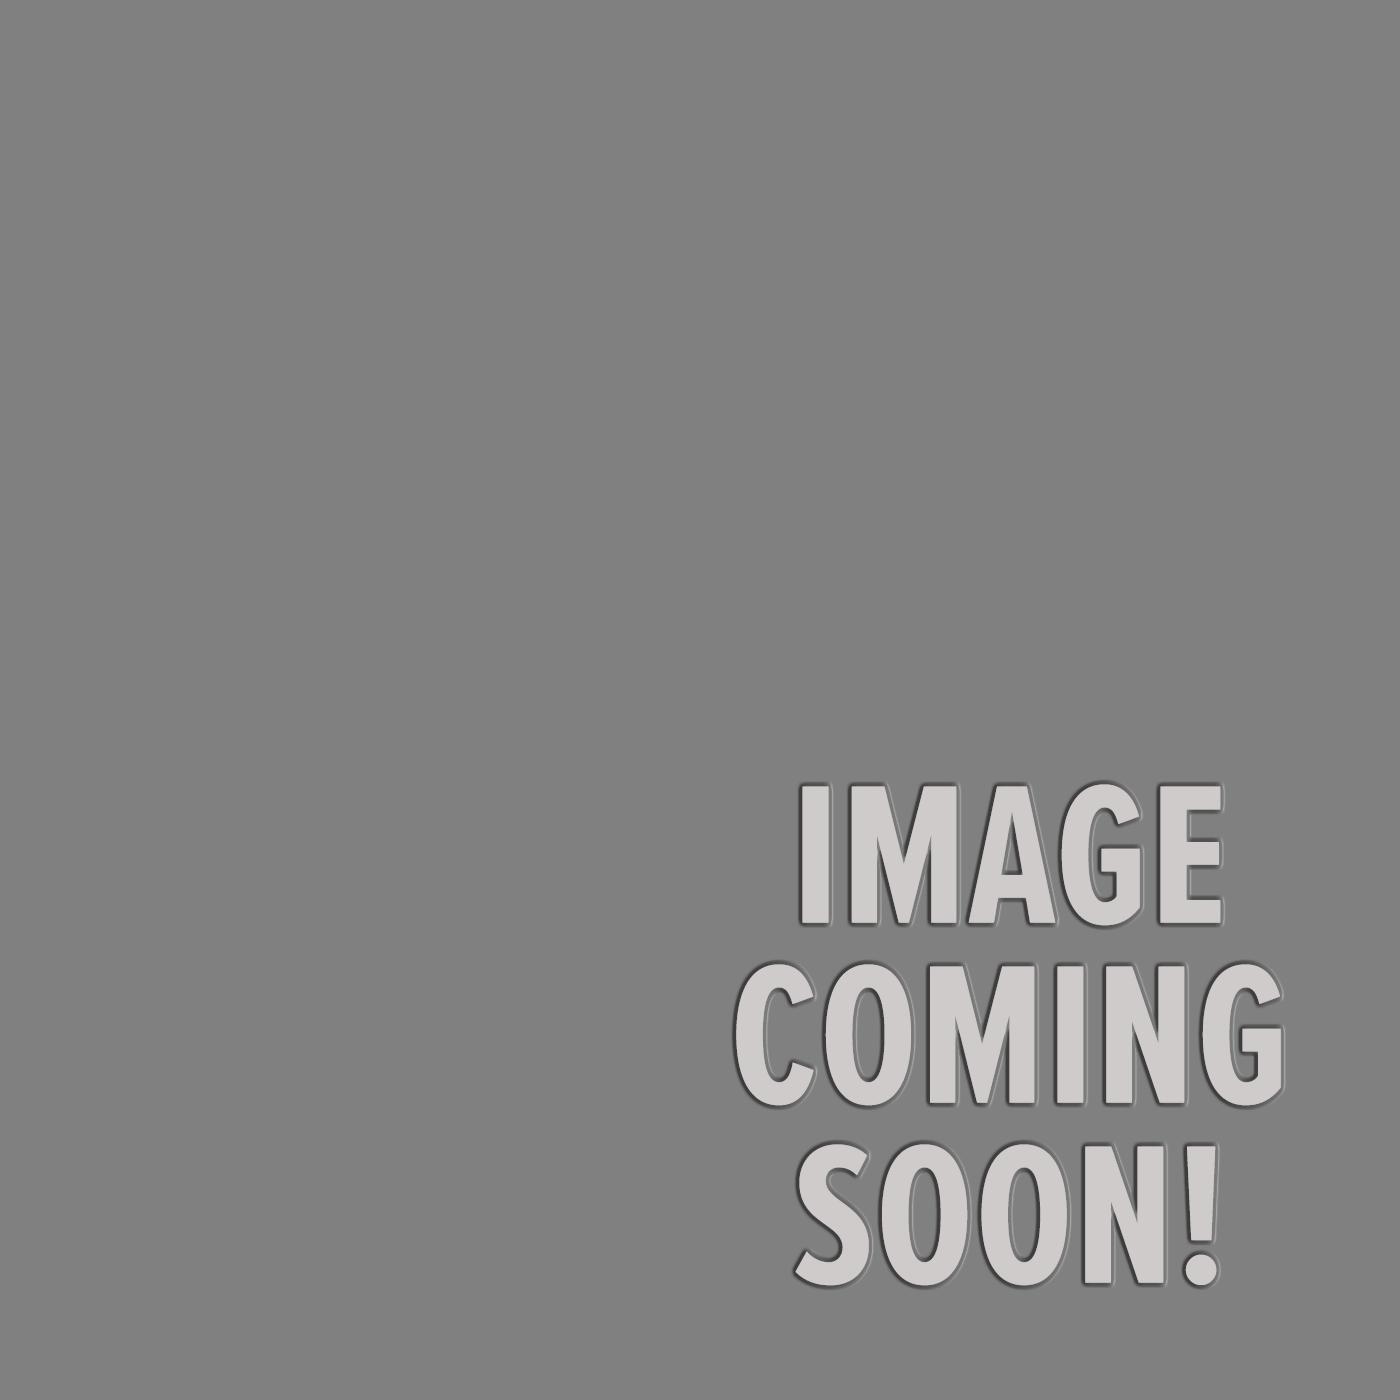 Image for Pro Series Signature Misha Mansoor Juggernaut HT7 7-String Electric Guitar from SamAsh